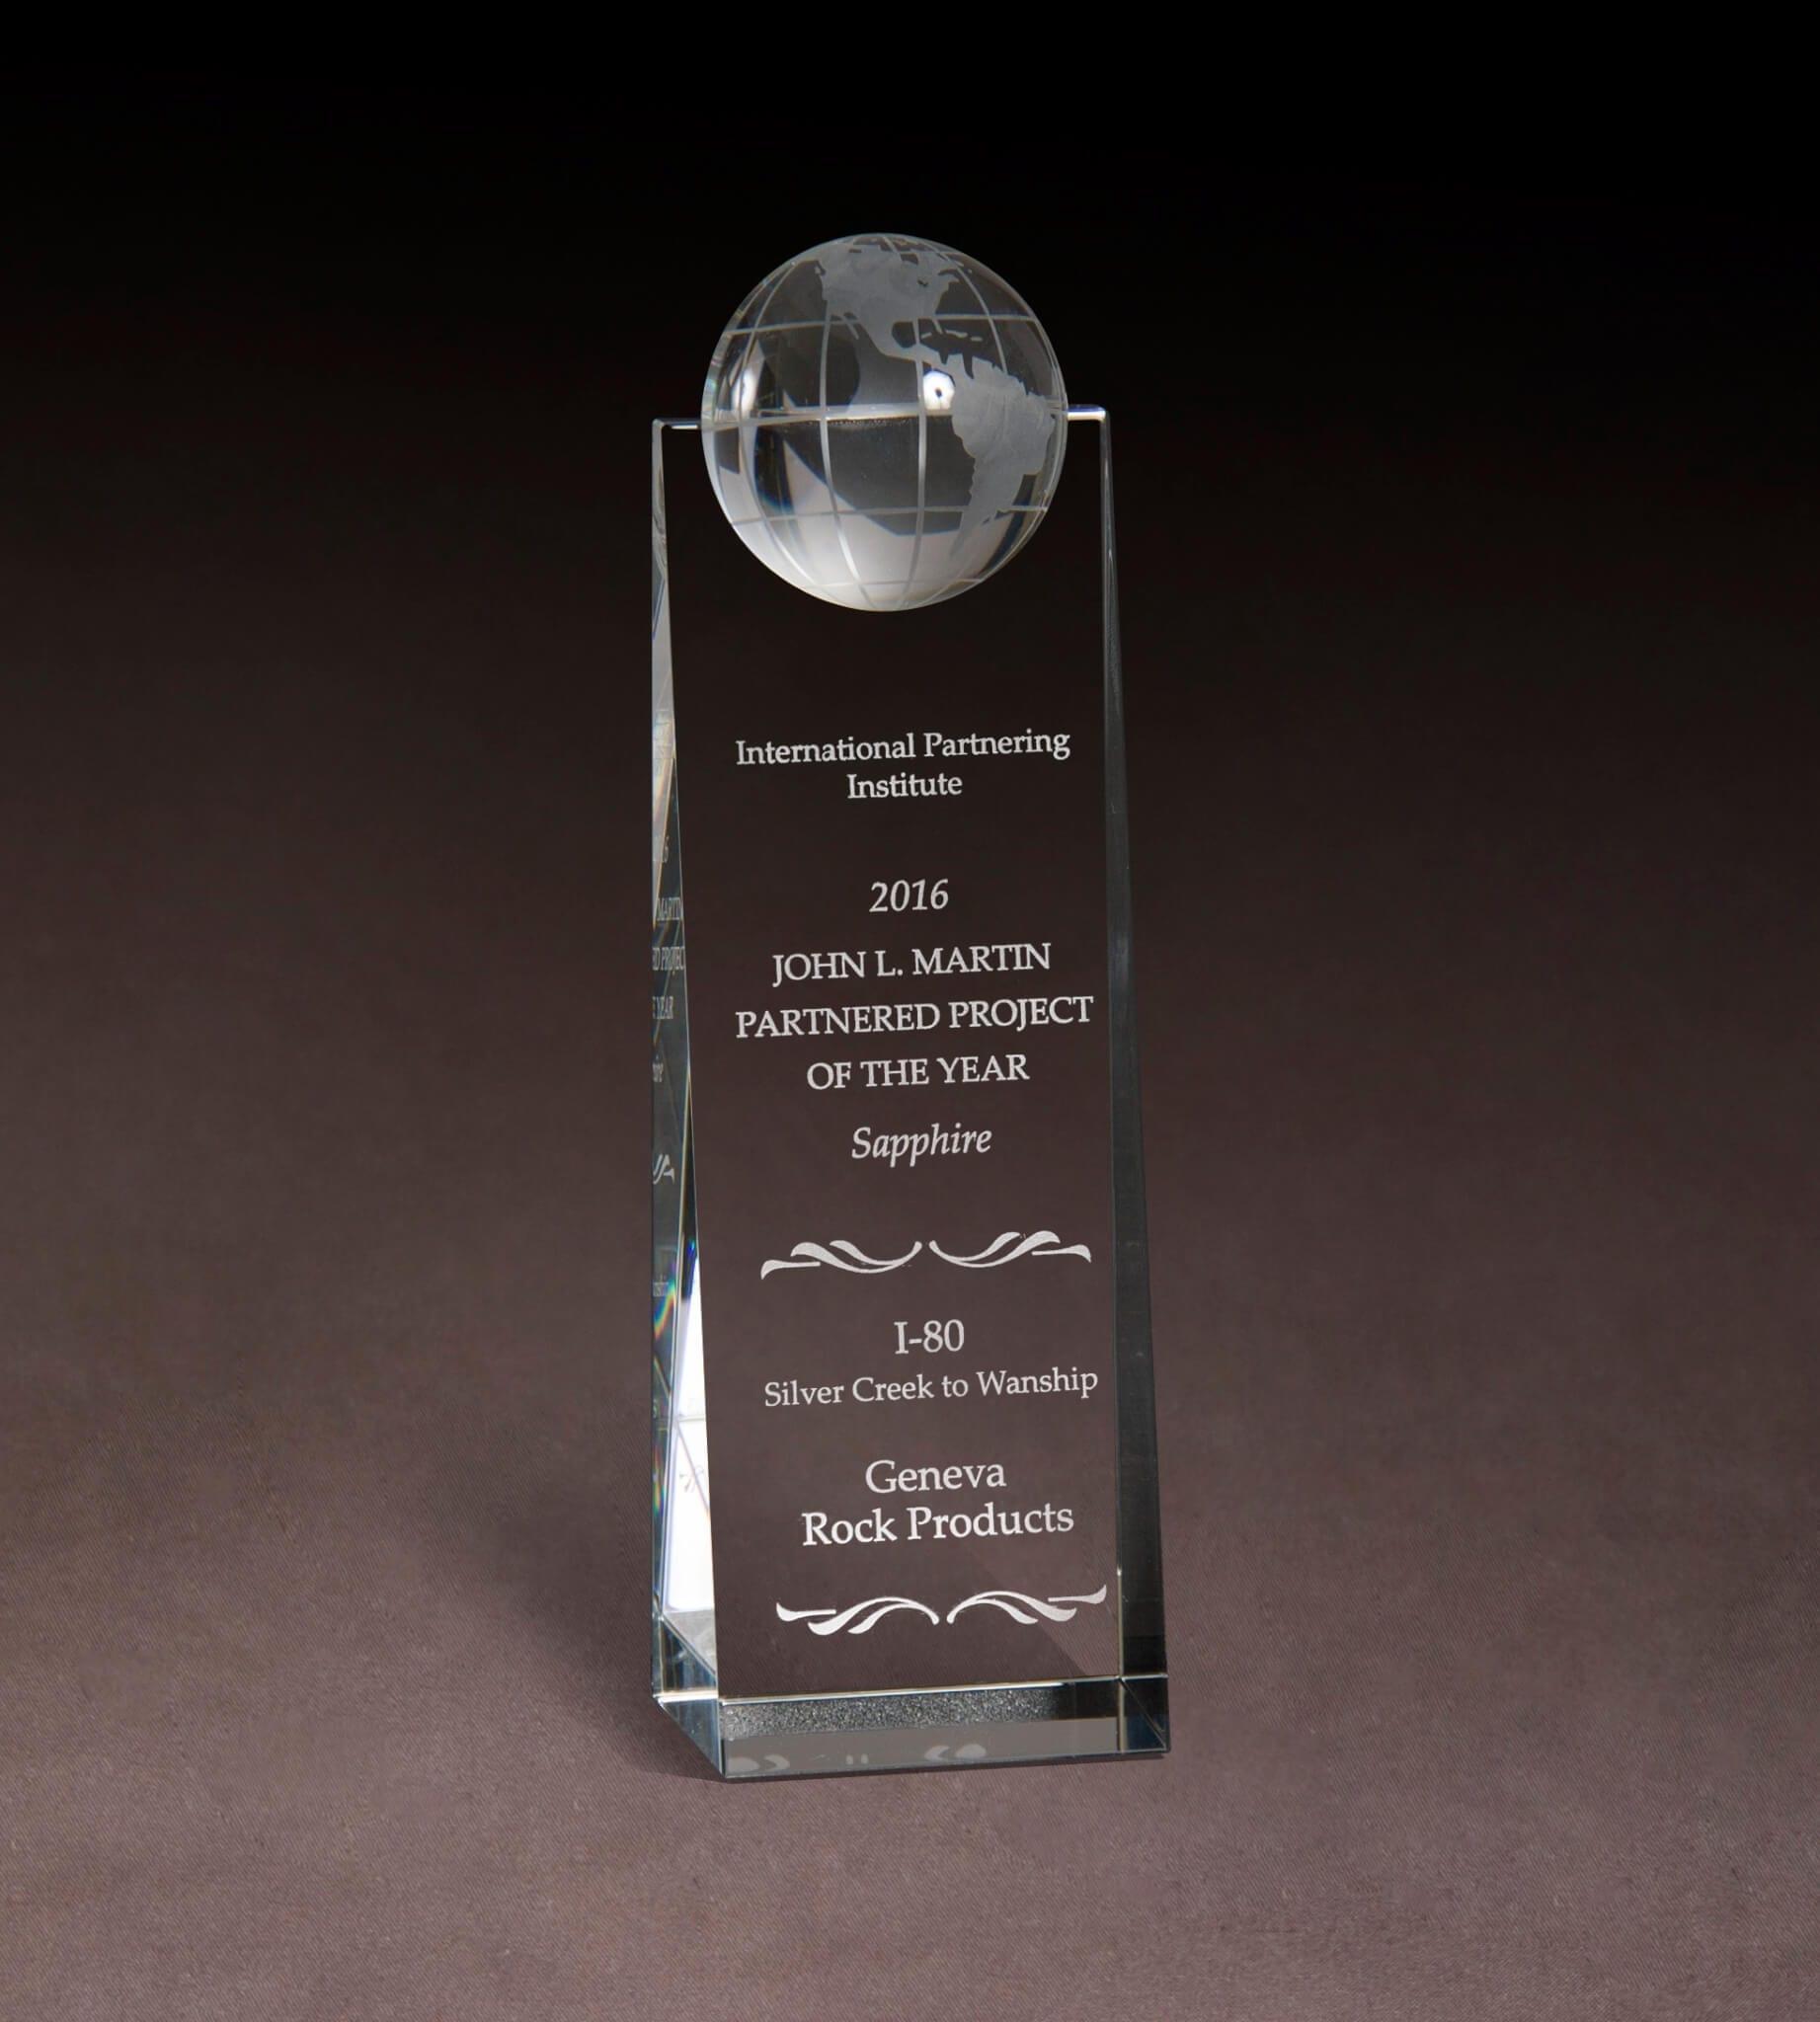 2016 John L. Martin Partnered Project of the Year Award